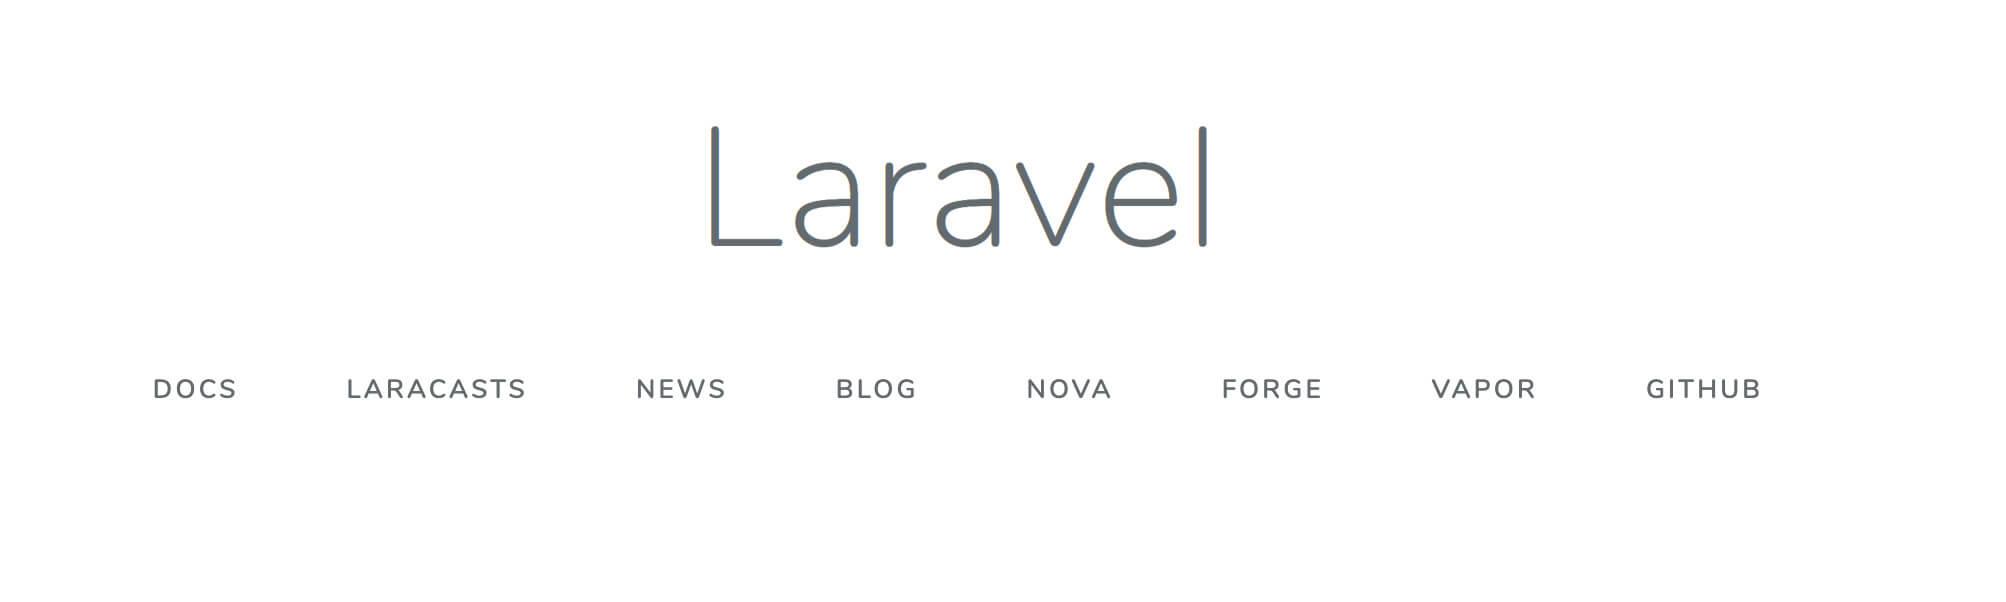 Laravelのトップ画面